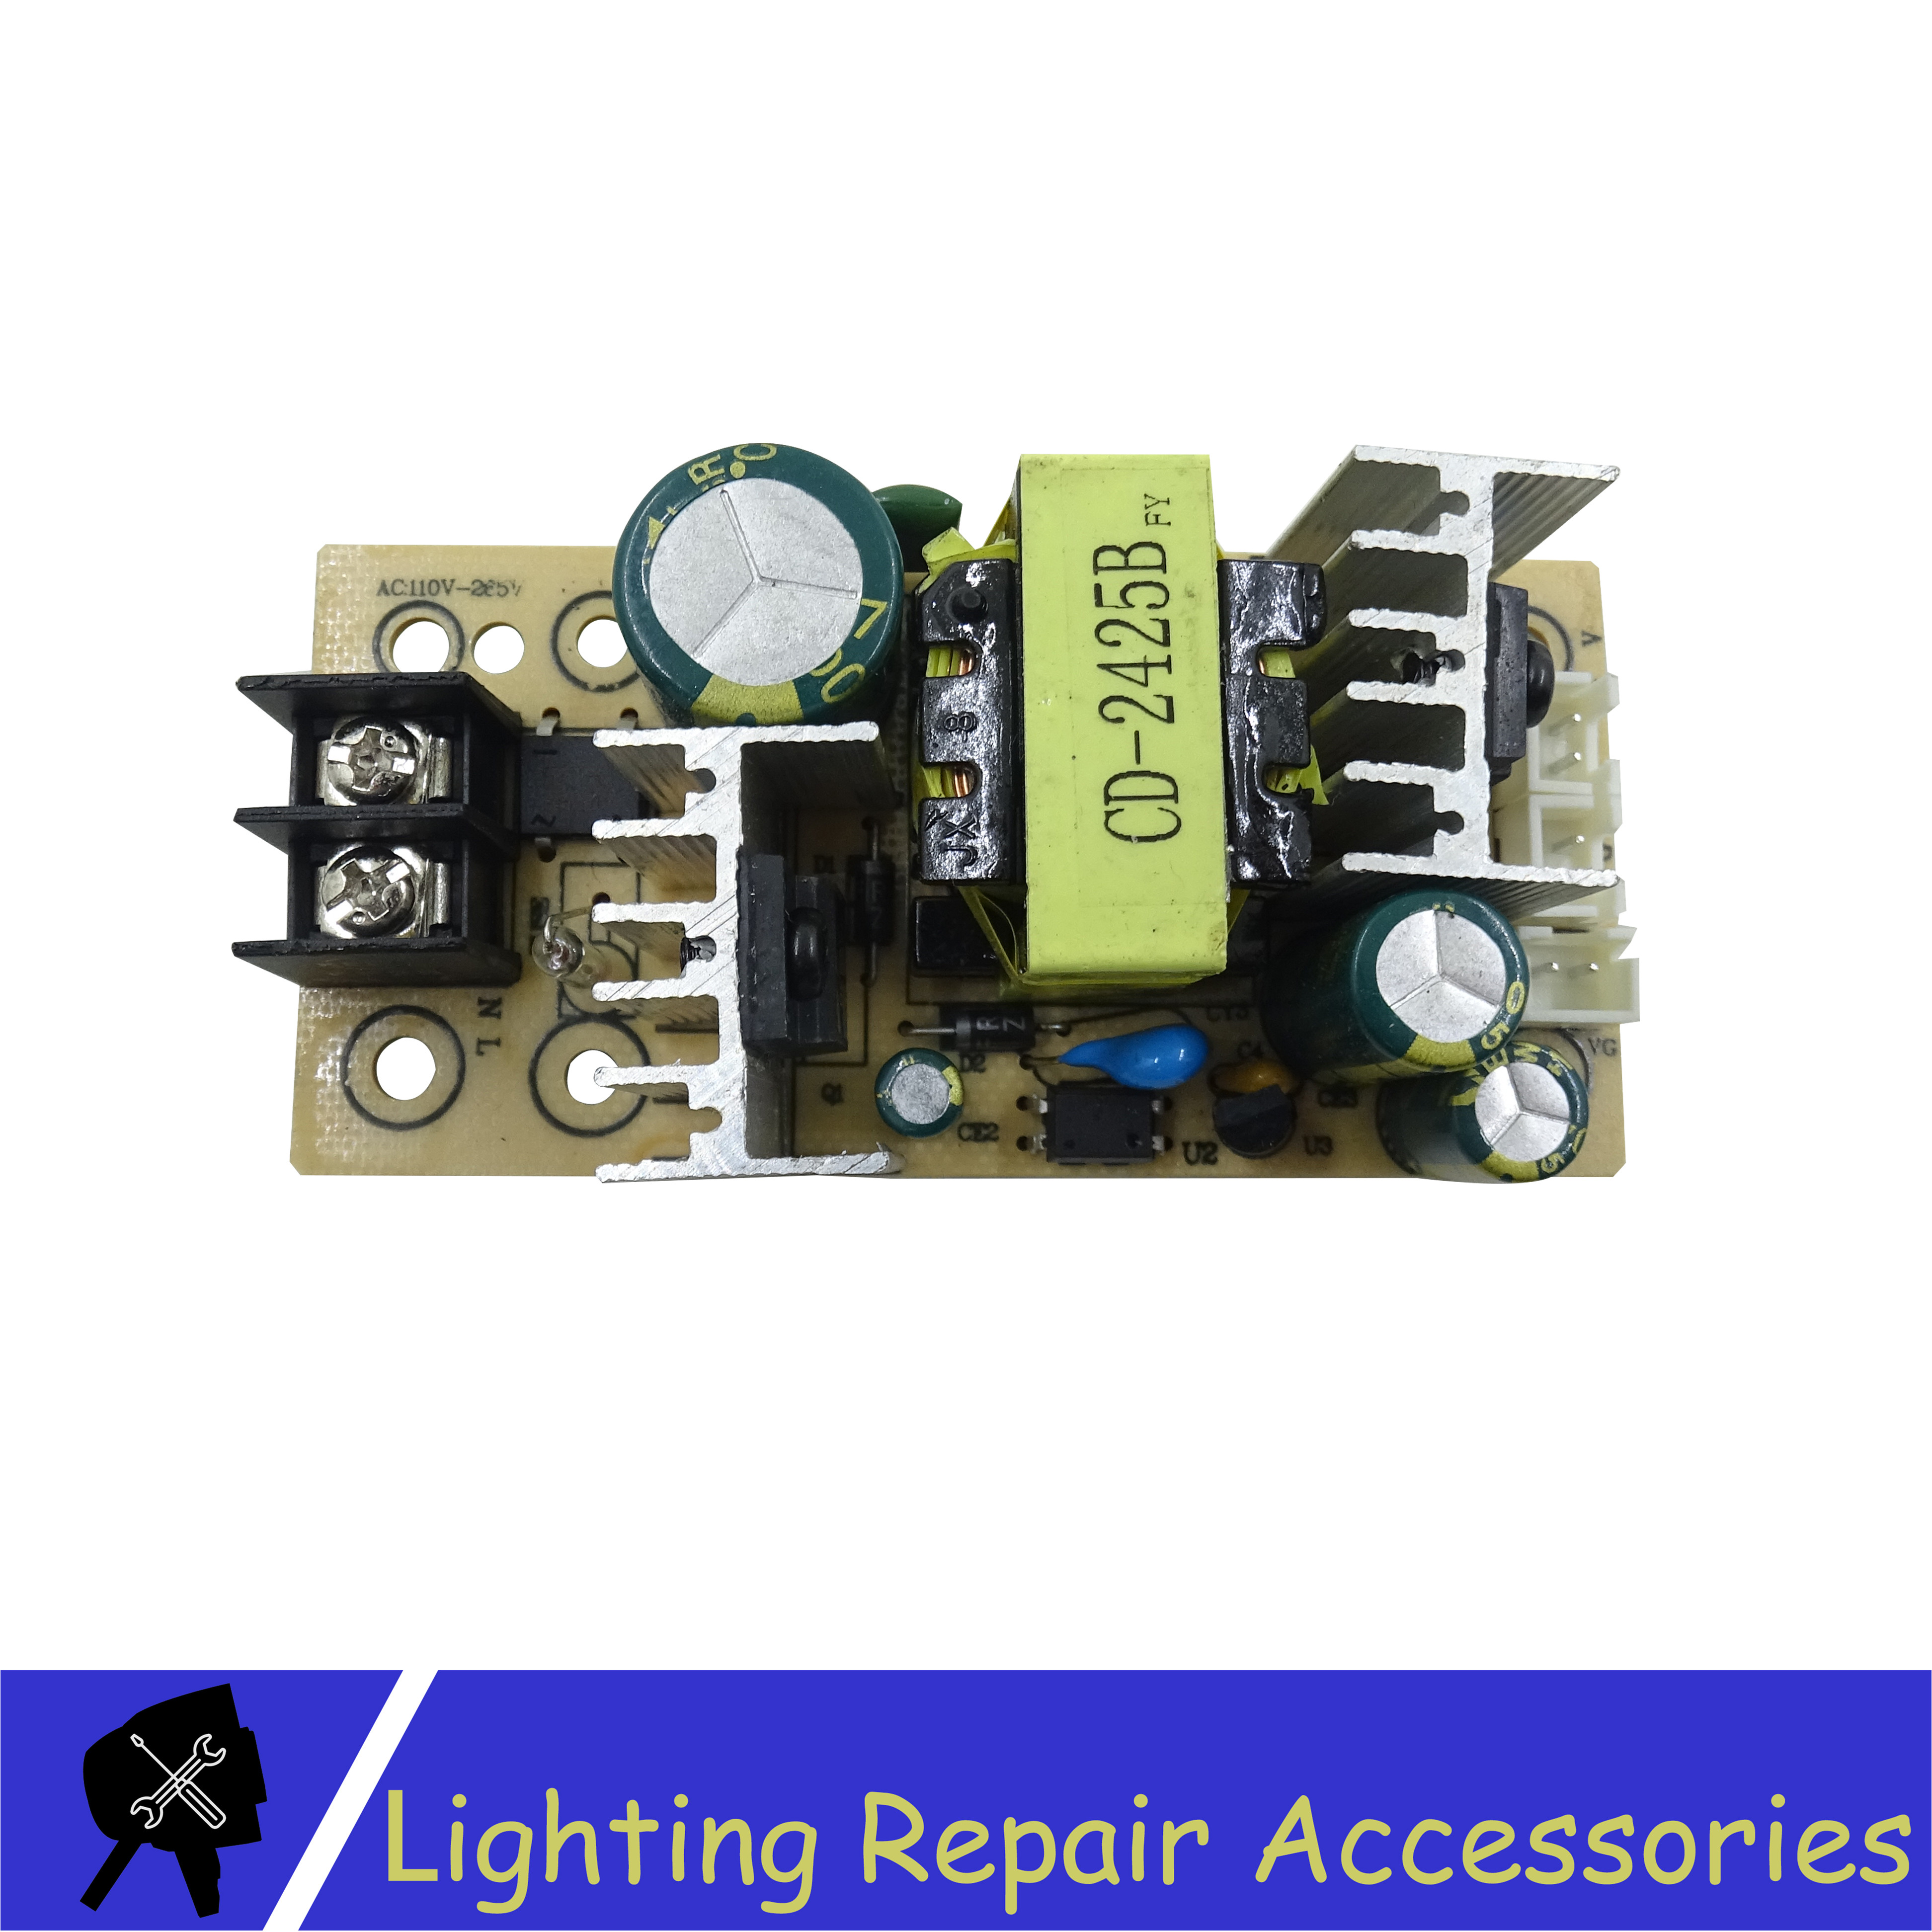 Power Supply 12v/24v Output 60-85w Power 110v/220v Inout For 18x3w 7x9w 7x10w 7x12w Led Par Lights Stage Light Repair Parts